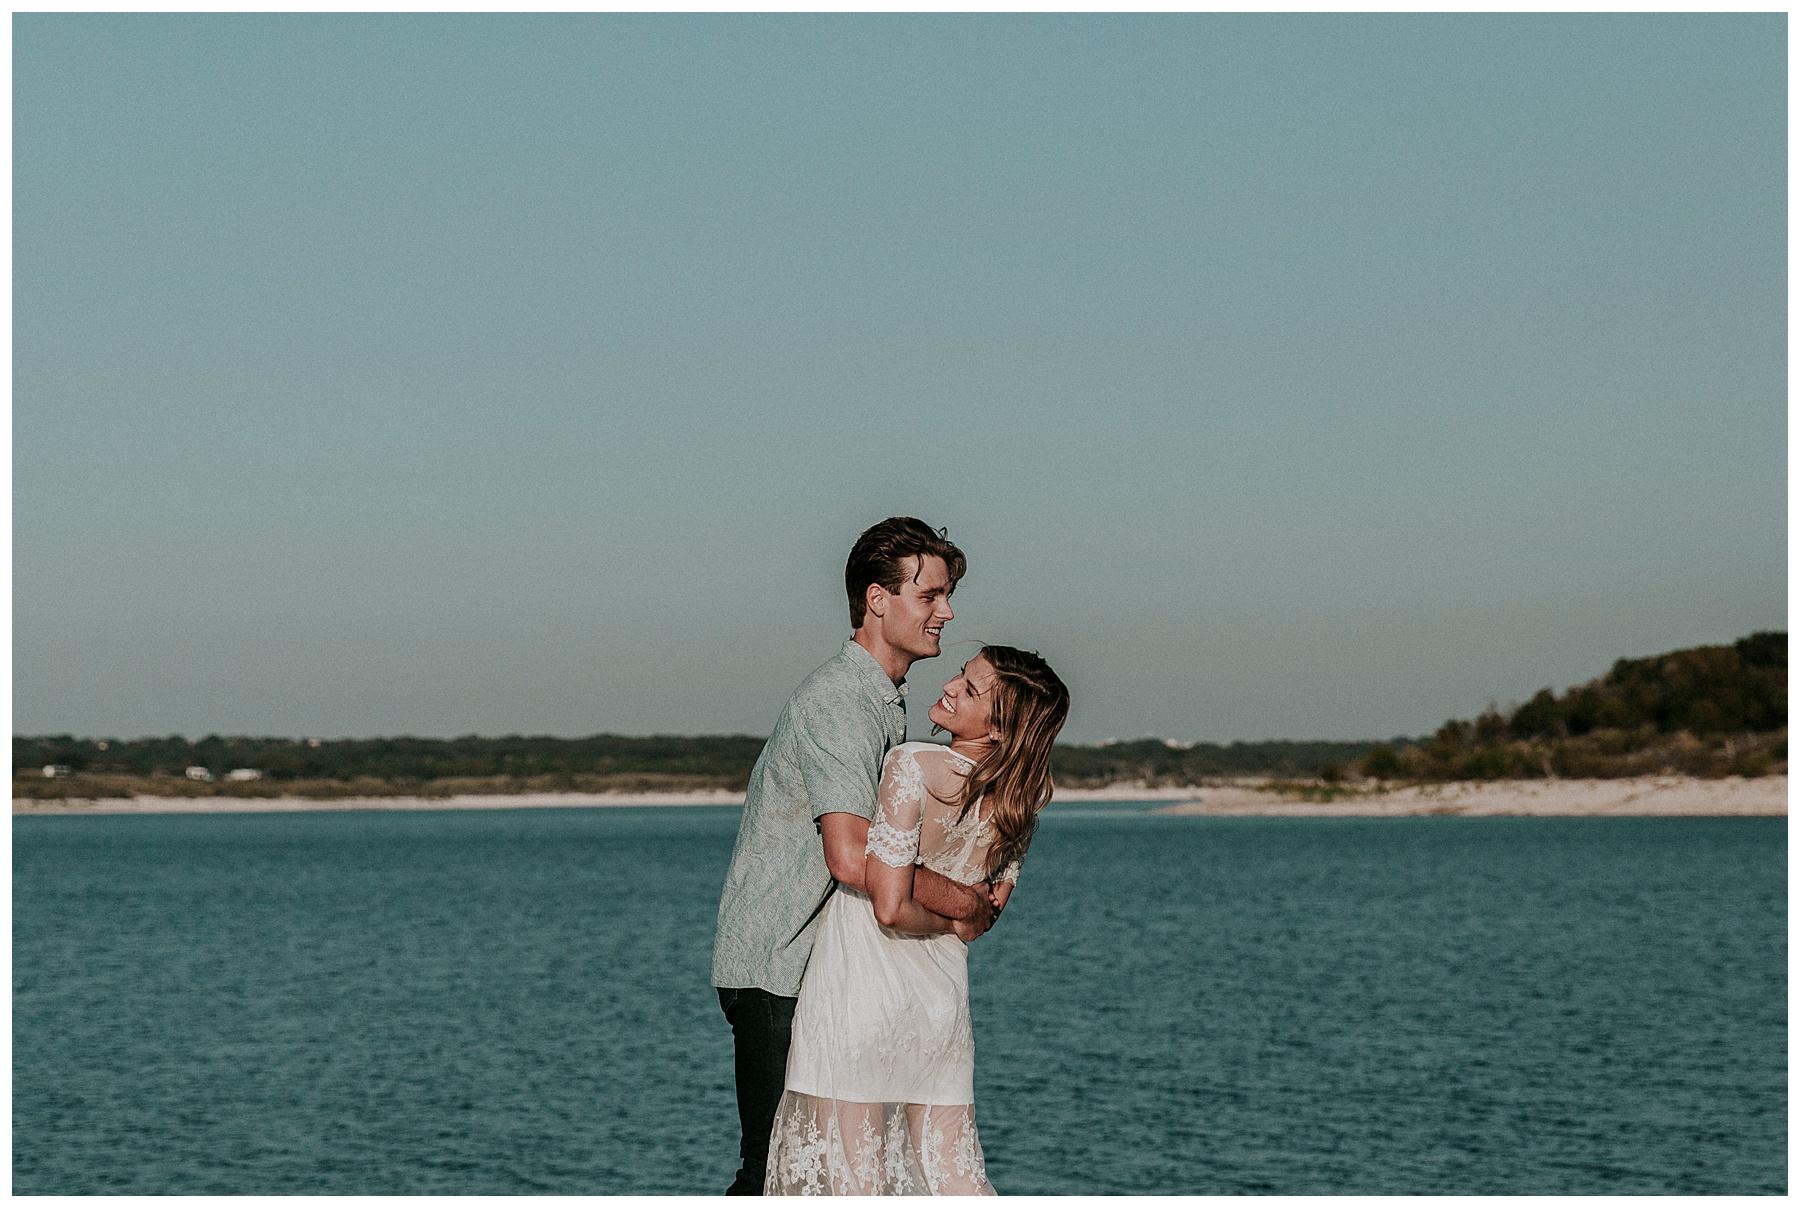 austin-texas-engagement-shoot4511.JPG